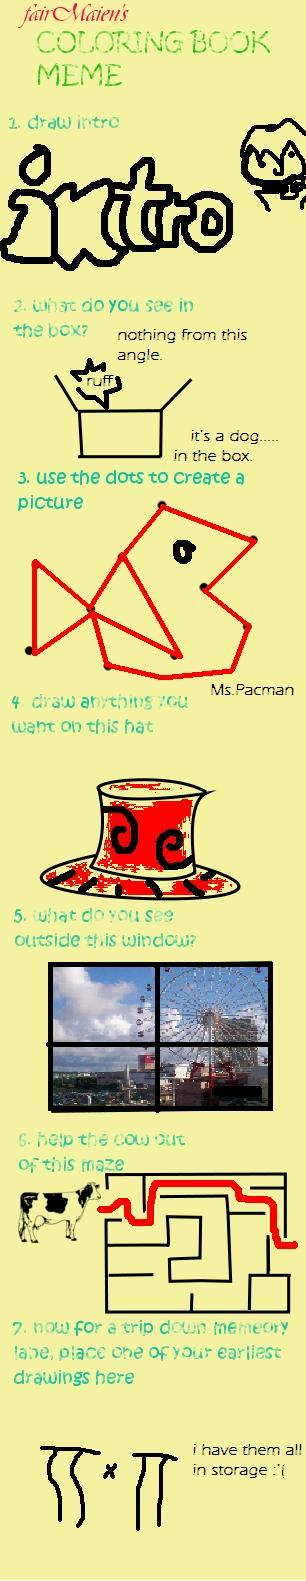 Coloring book meme by bananagosip808 on deviantart Coloring book meme